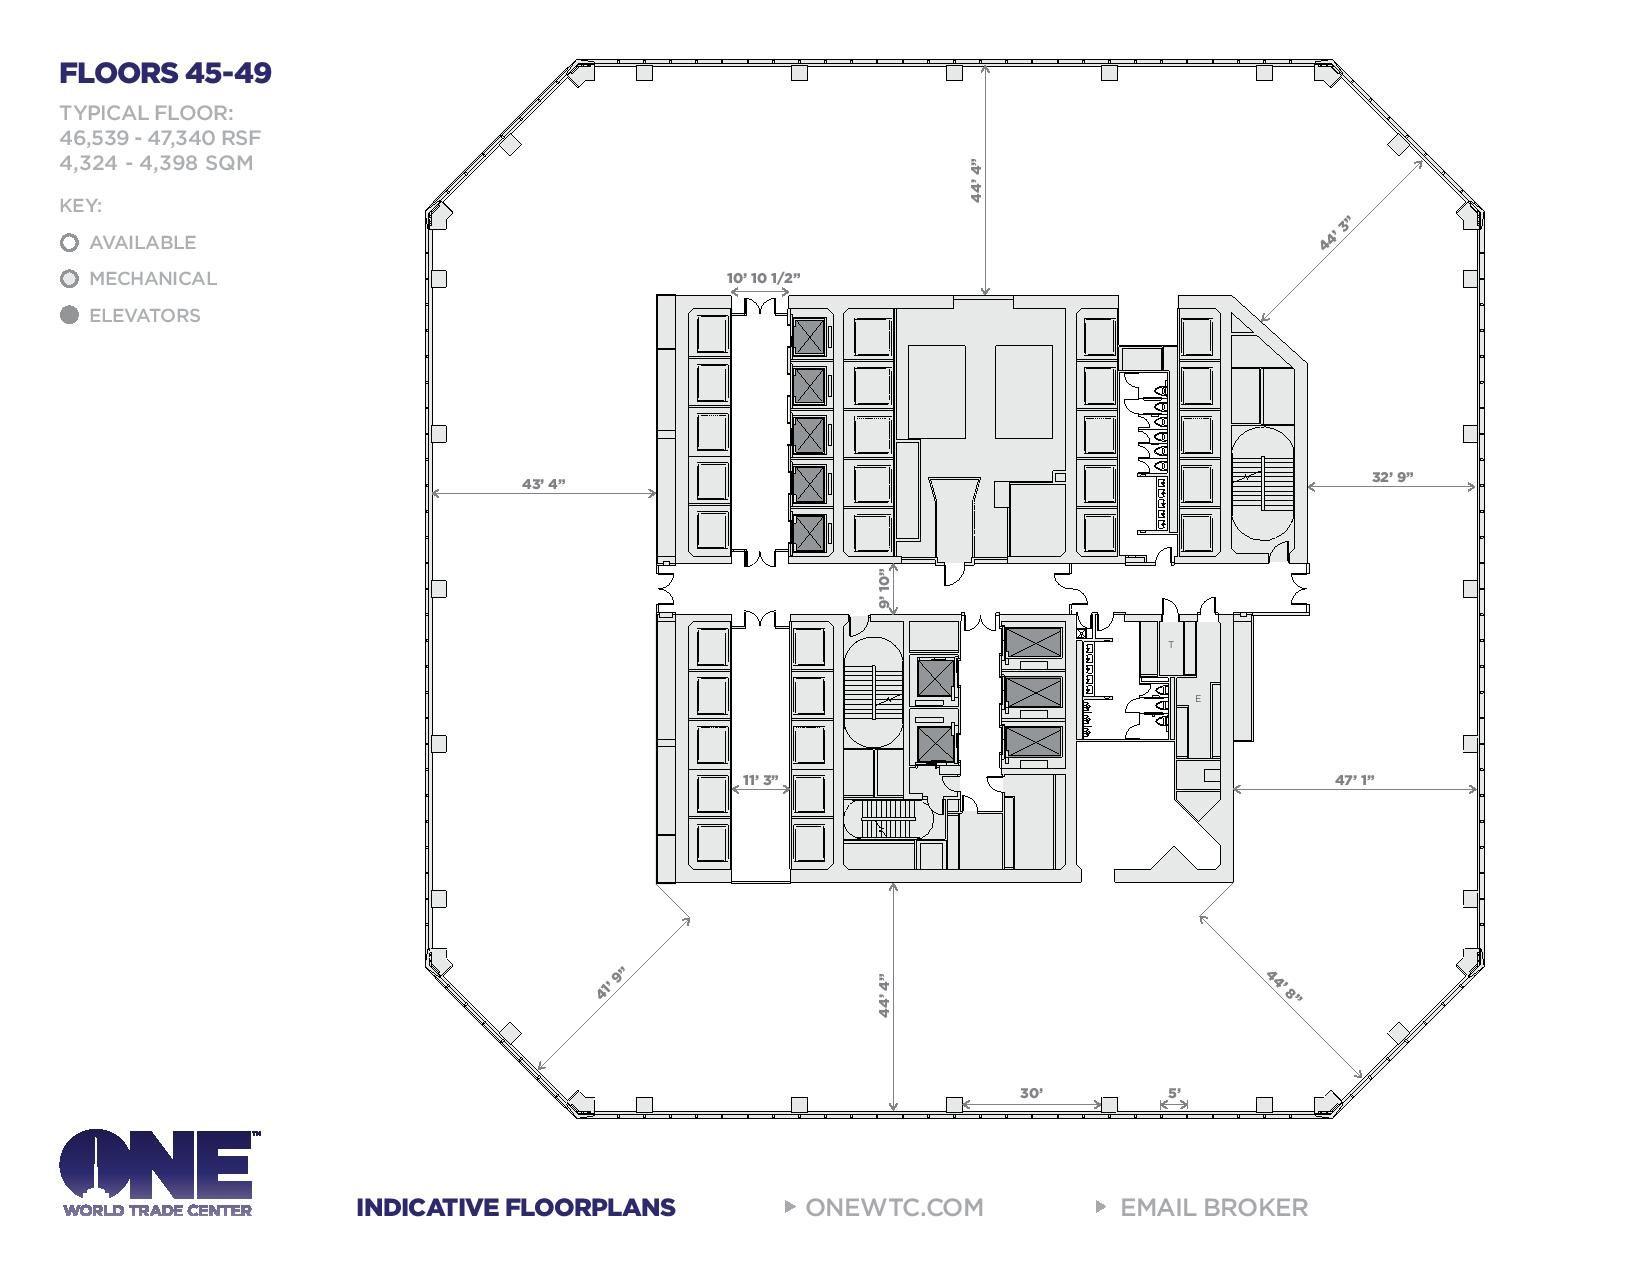 Pin By Gayathri Segar On High Rise Floor Plans How To Plan Flooring